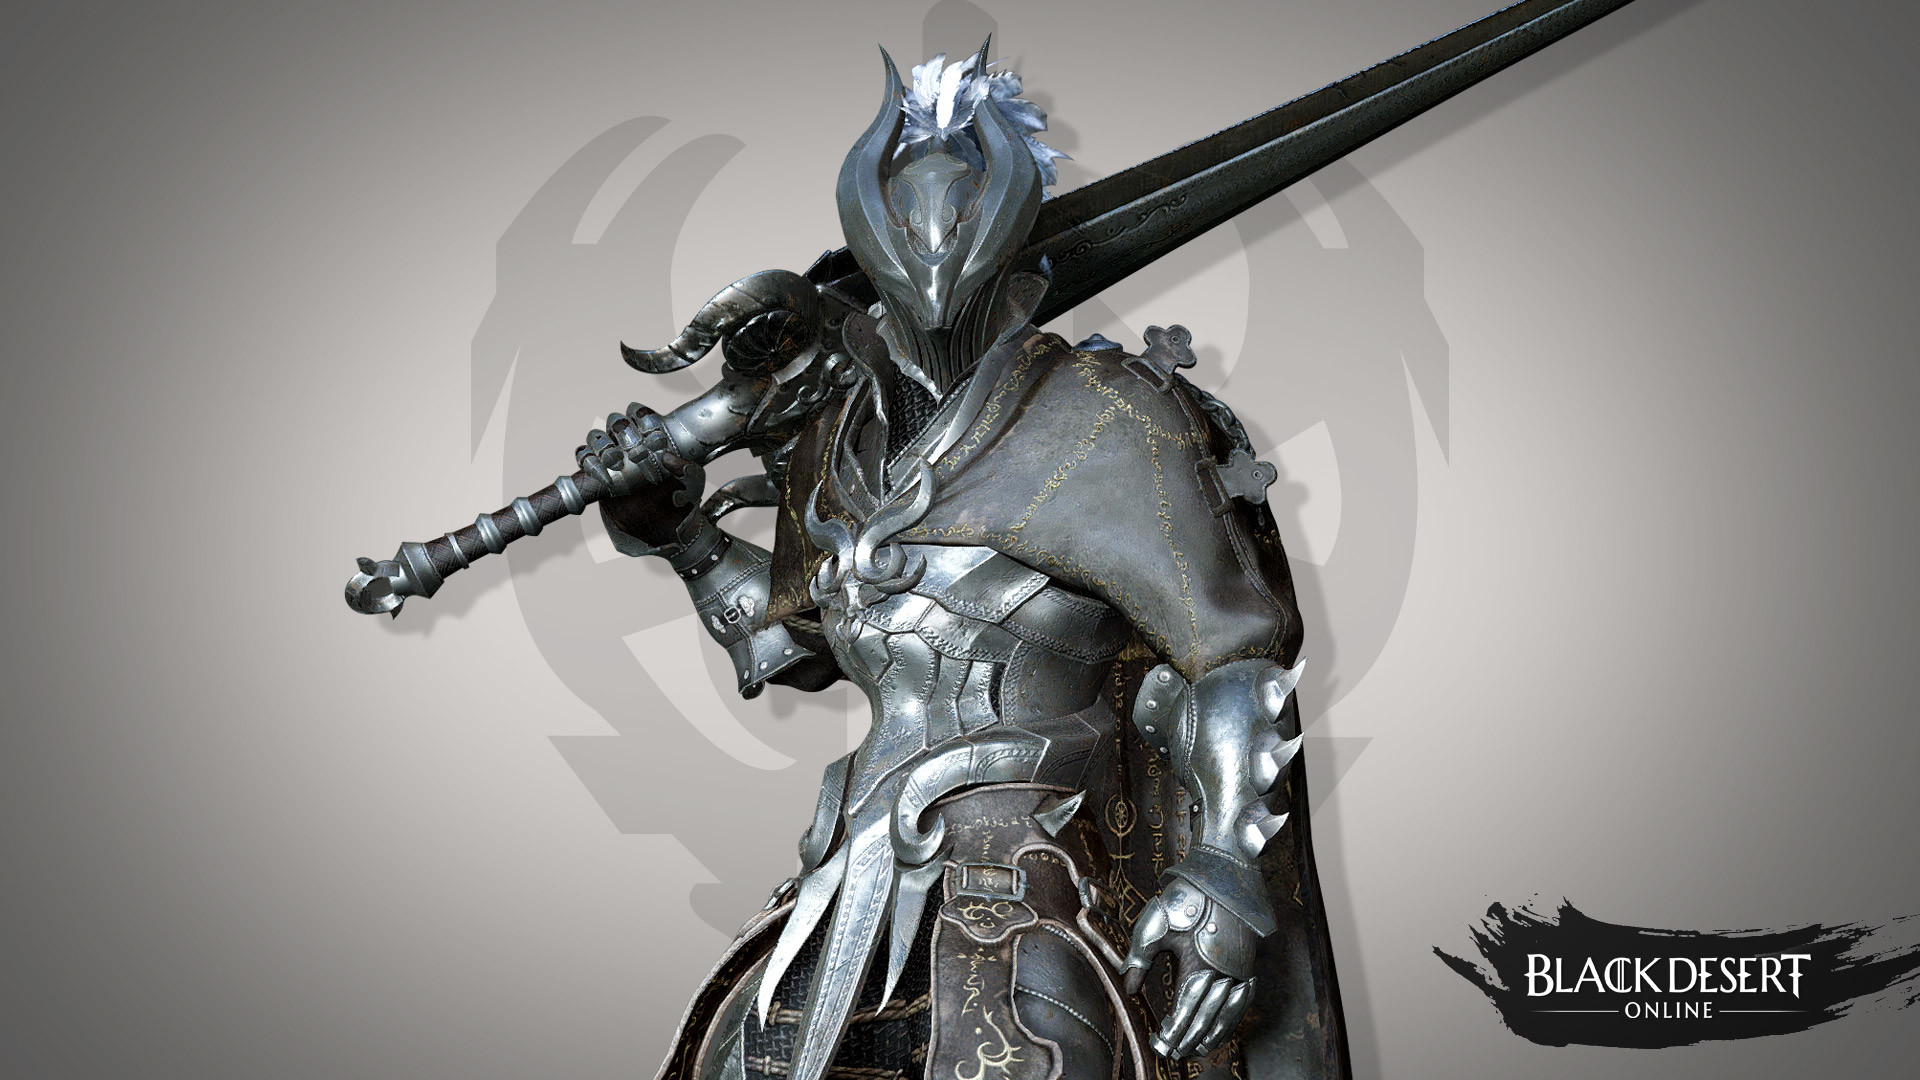 2 Warrior (Black Desert Online) HD Wallpapers | Backgrounds – Wallpaper  Abyss